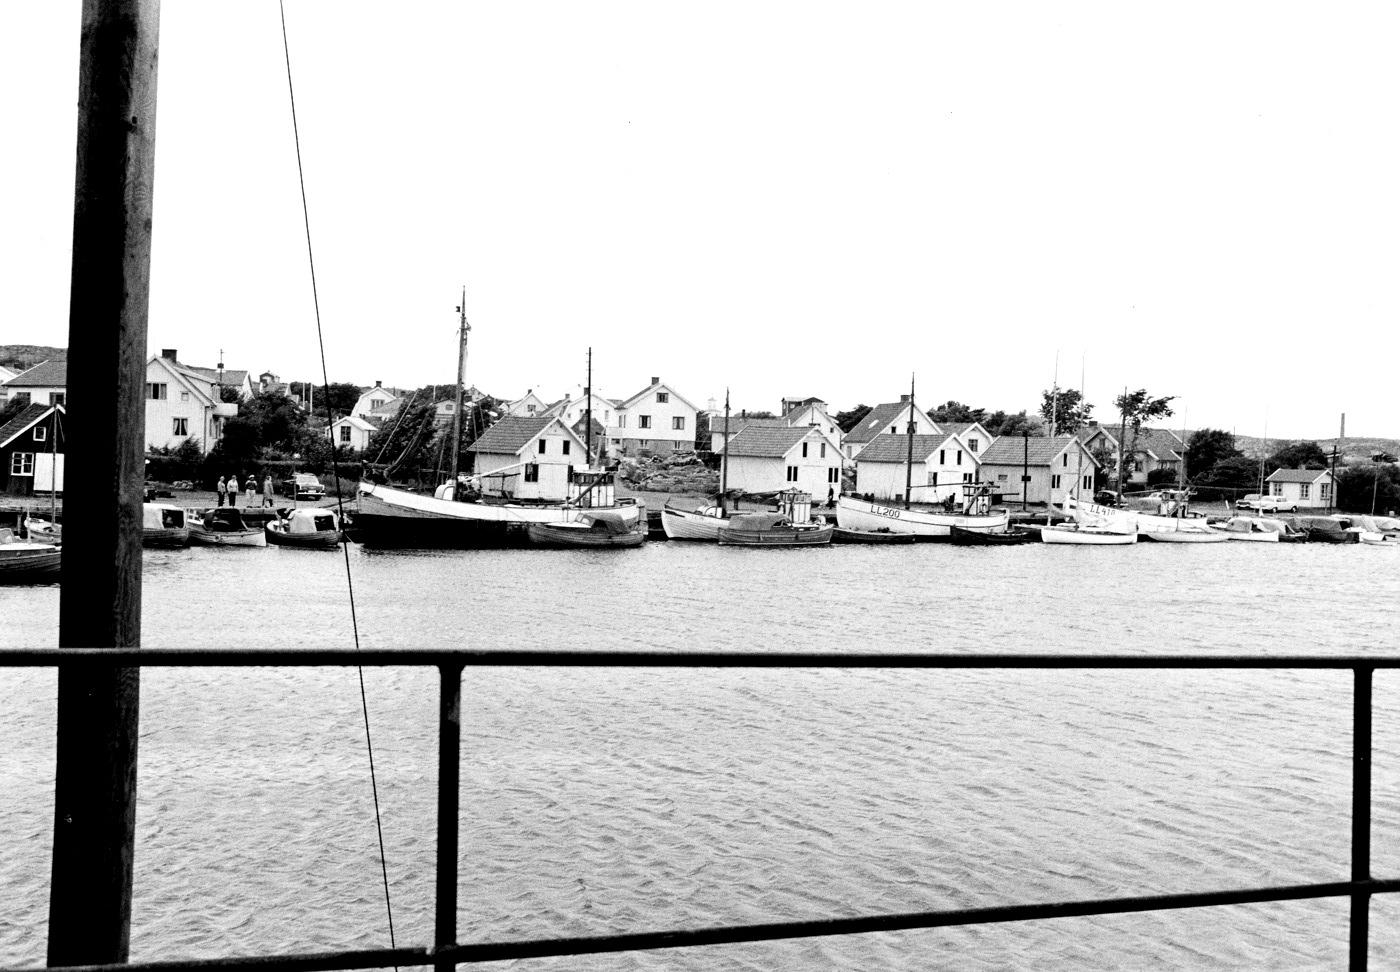 Foto Claes Funck 1963. Fiskebåter vid fiskehamn.